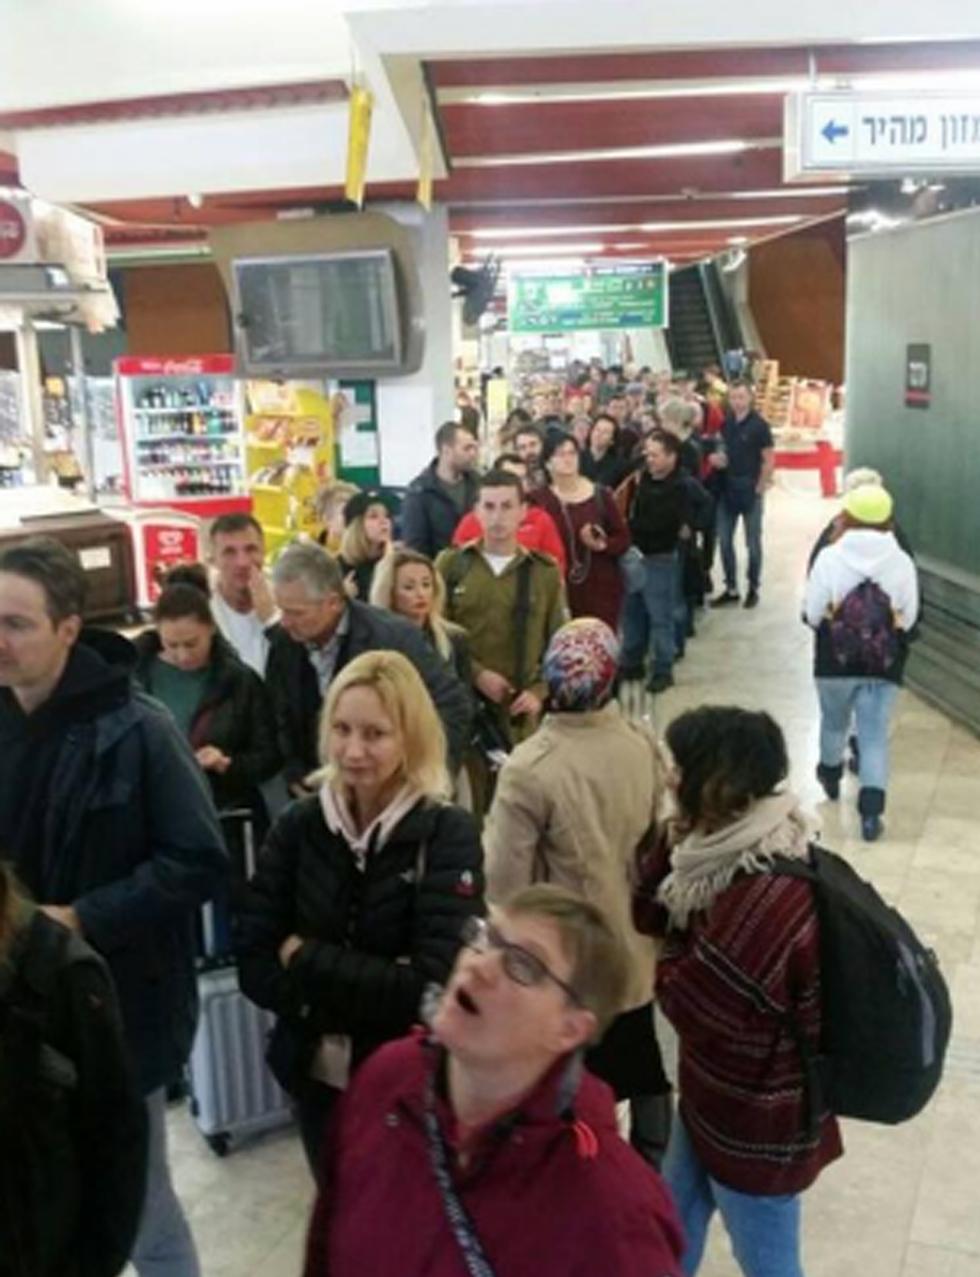 Overcrowded public transit